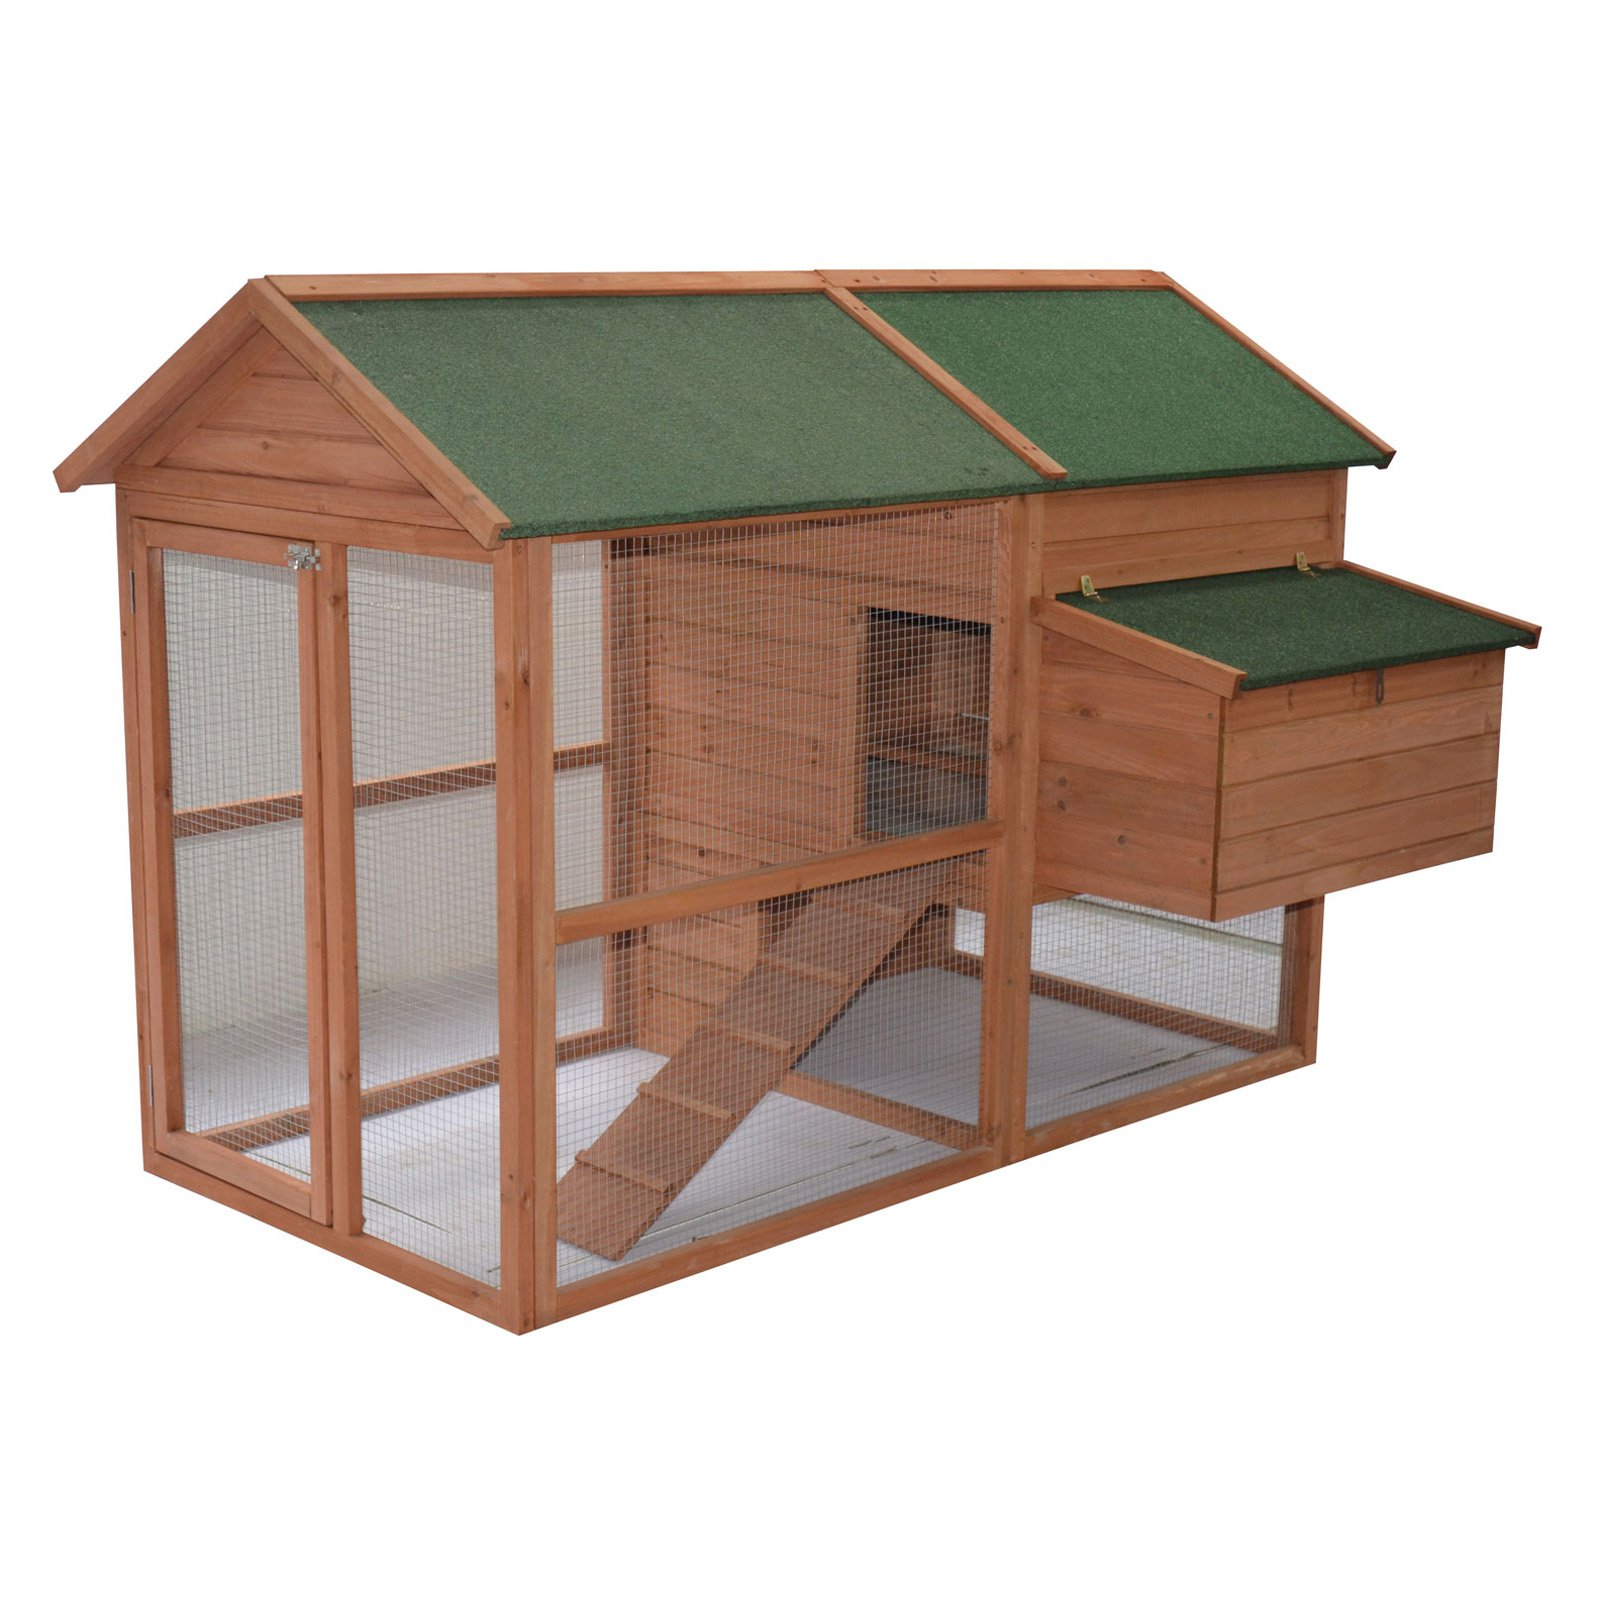 Pawhut Hen House Wooden Backyard Chicken Coop